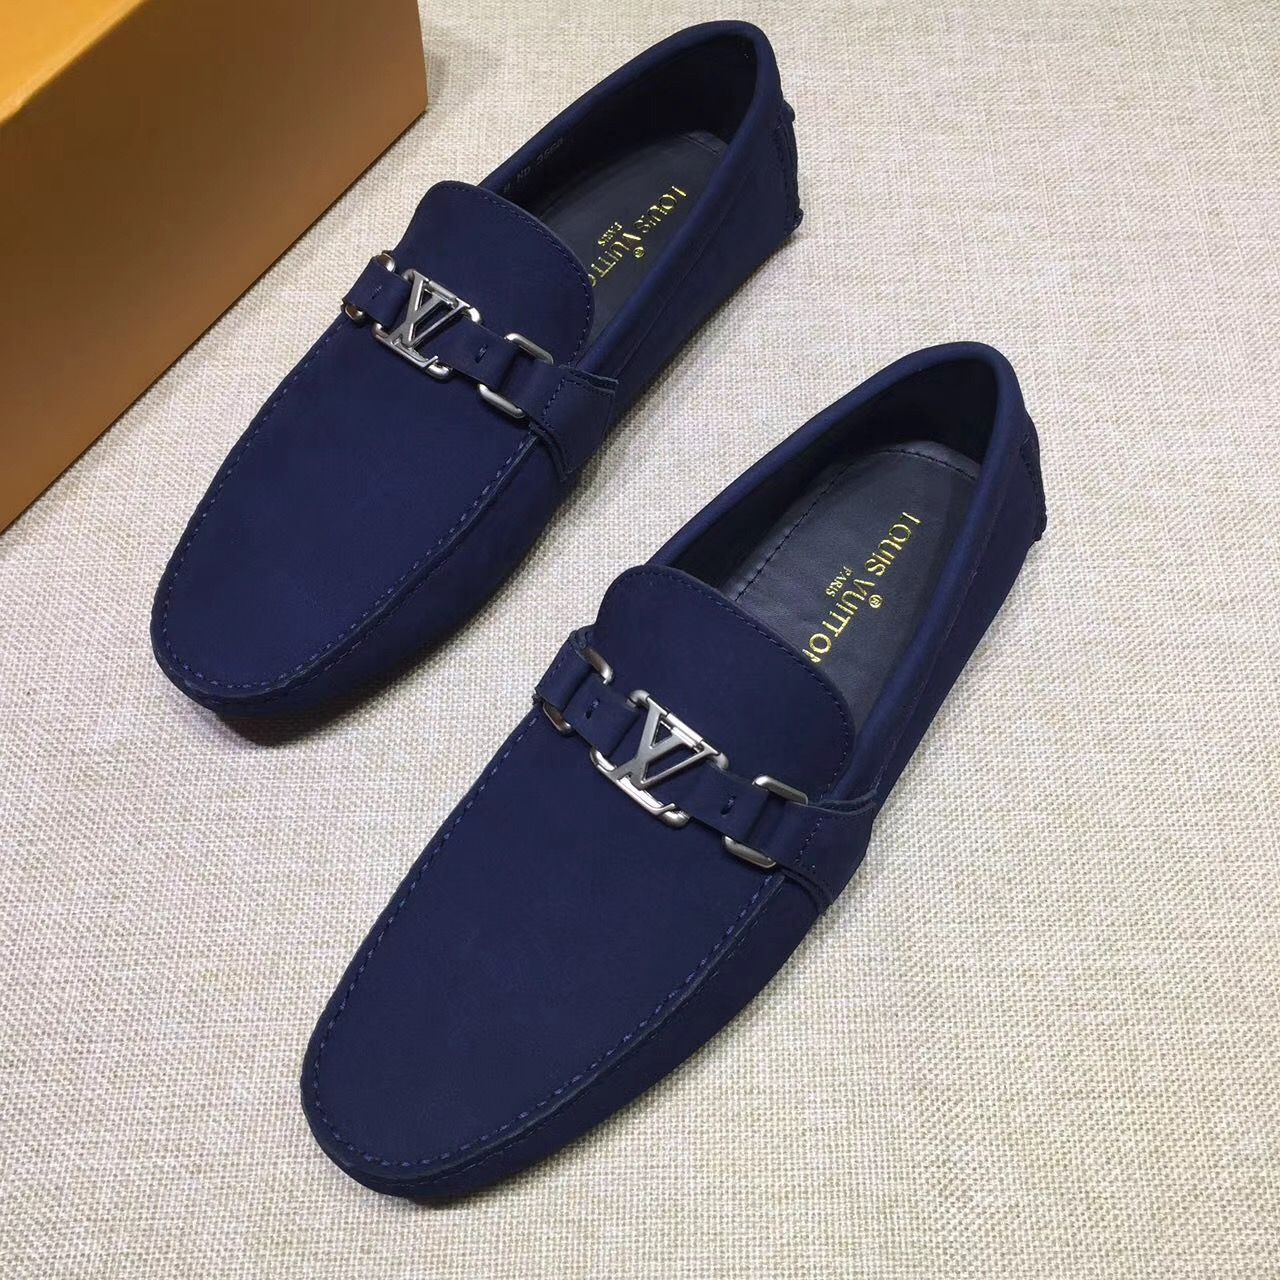 Louis Vuitton Lv Man Shoes Leather Loafers Lv Men Shoes Leather